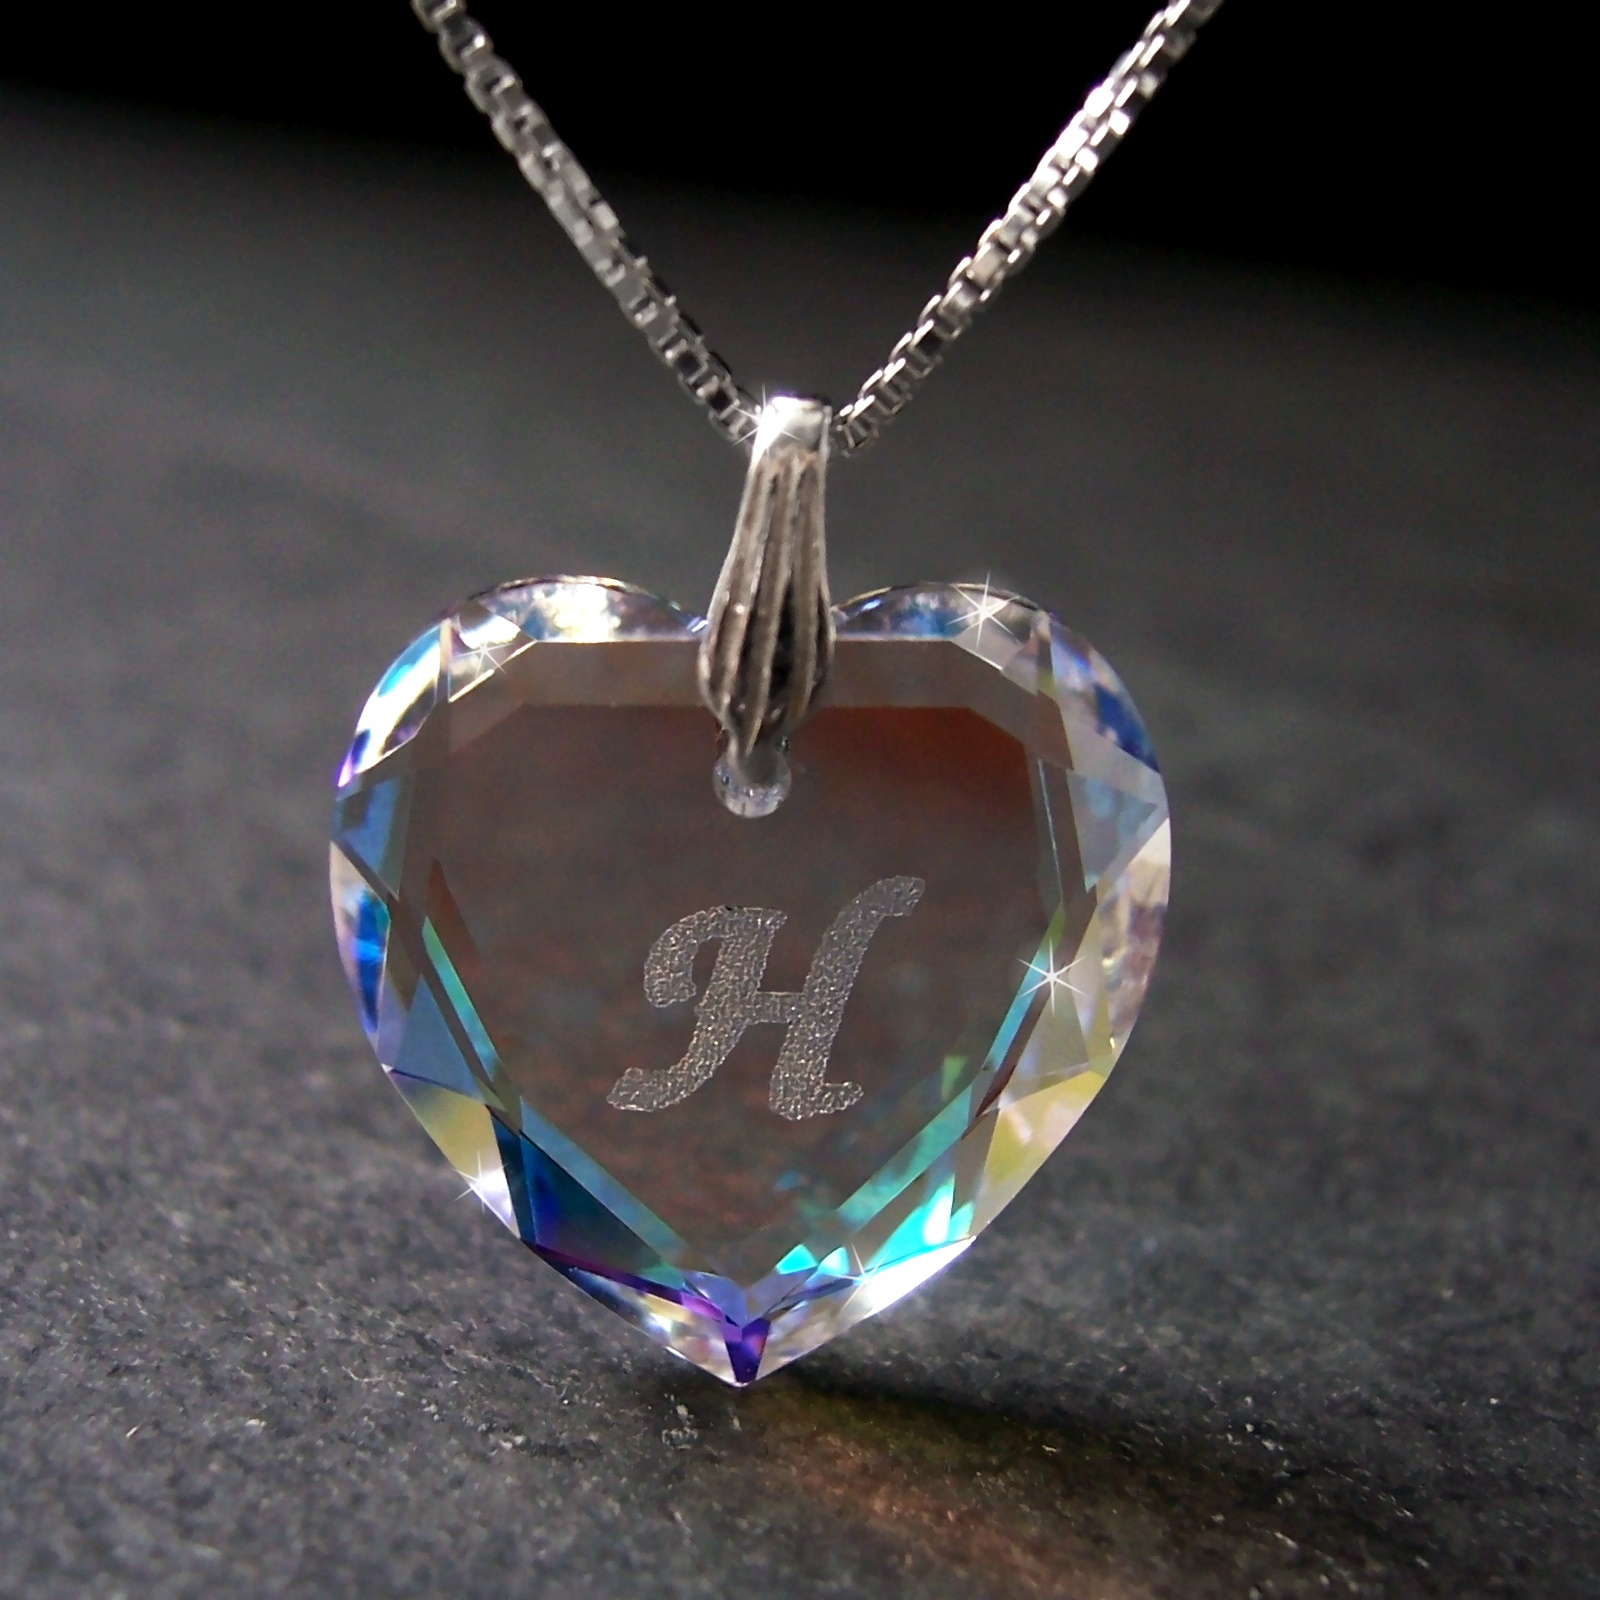 Kette 925 Silber Venezia 45cm Herz Swarovski Kristall BlueAB 1631245-H